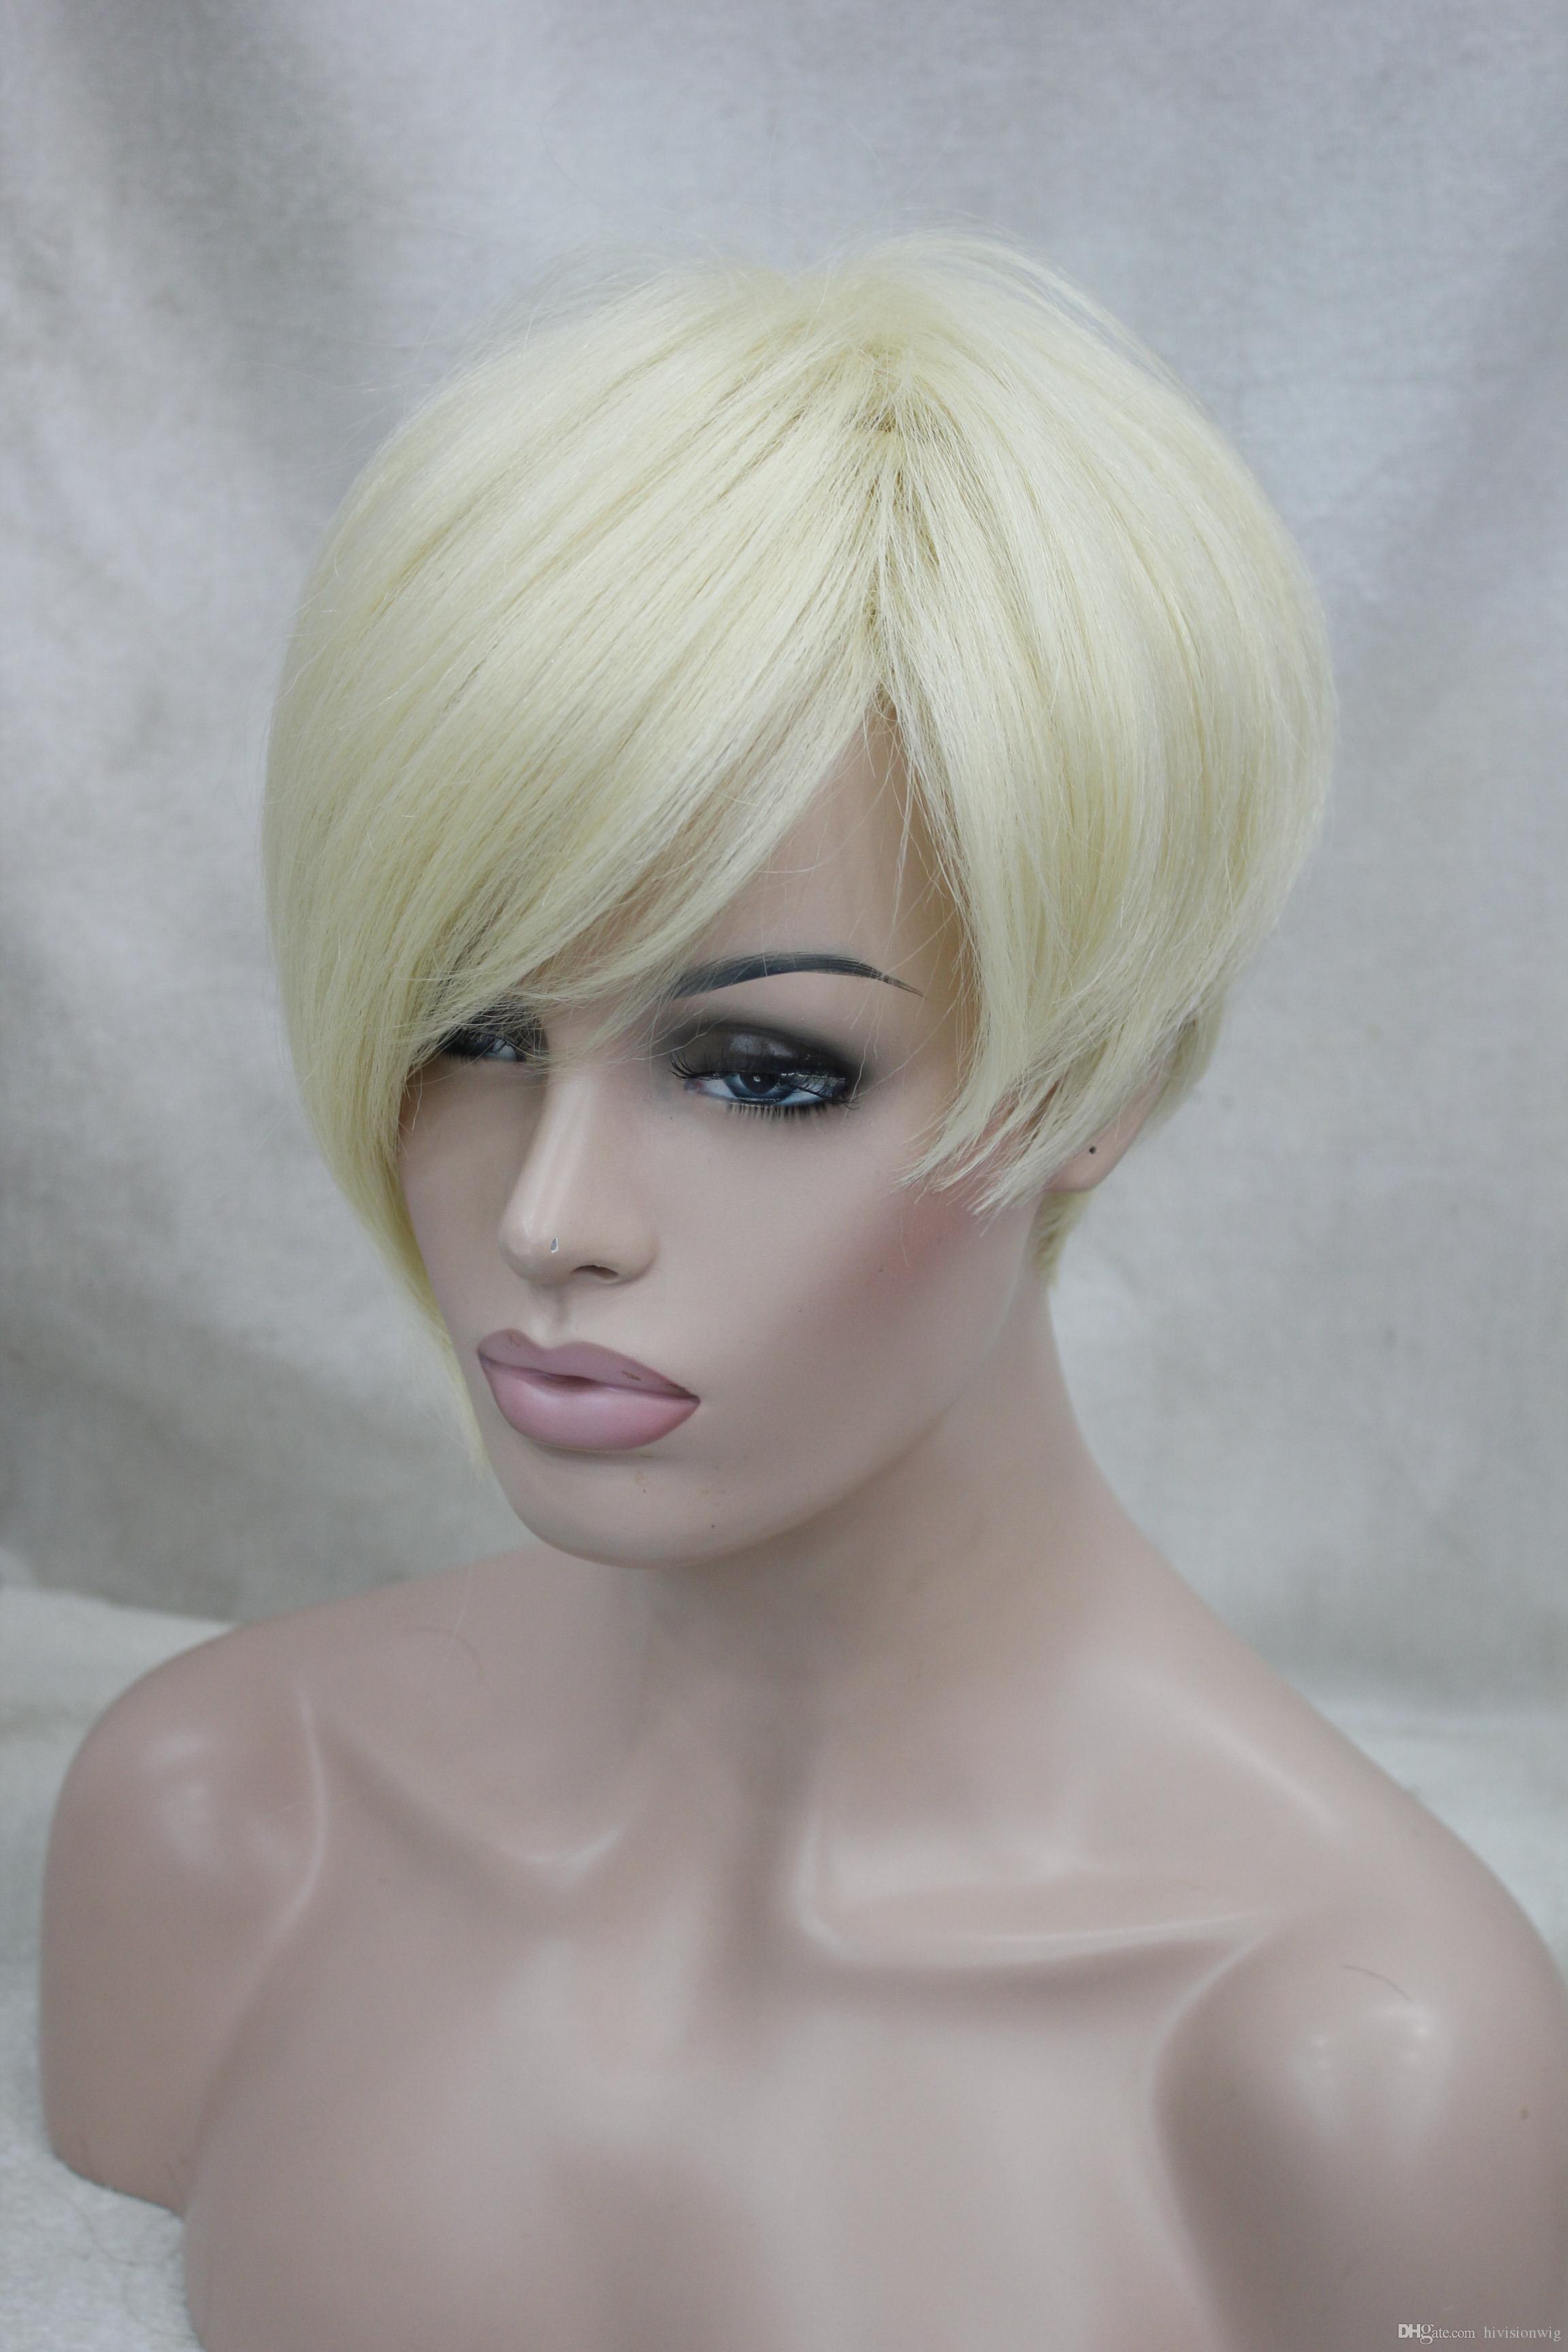 !Hivision 2017 New Fashion High End Asymmetric Fashion Model Blonde Everyday  Life Wigs Best Hair Wigs Wigs Black Women From Hivisionwig daa8189a93da